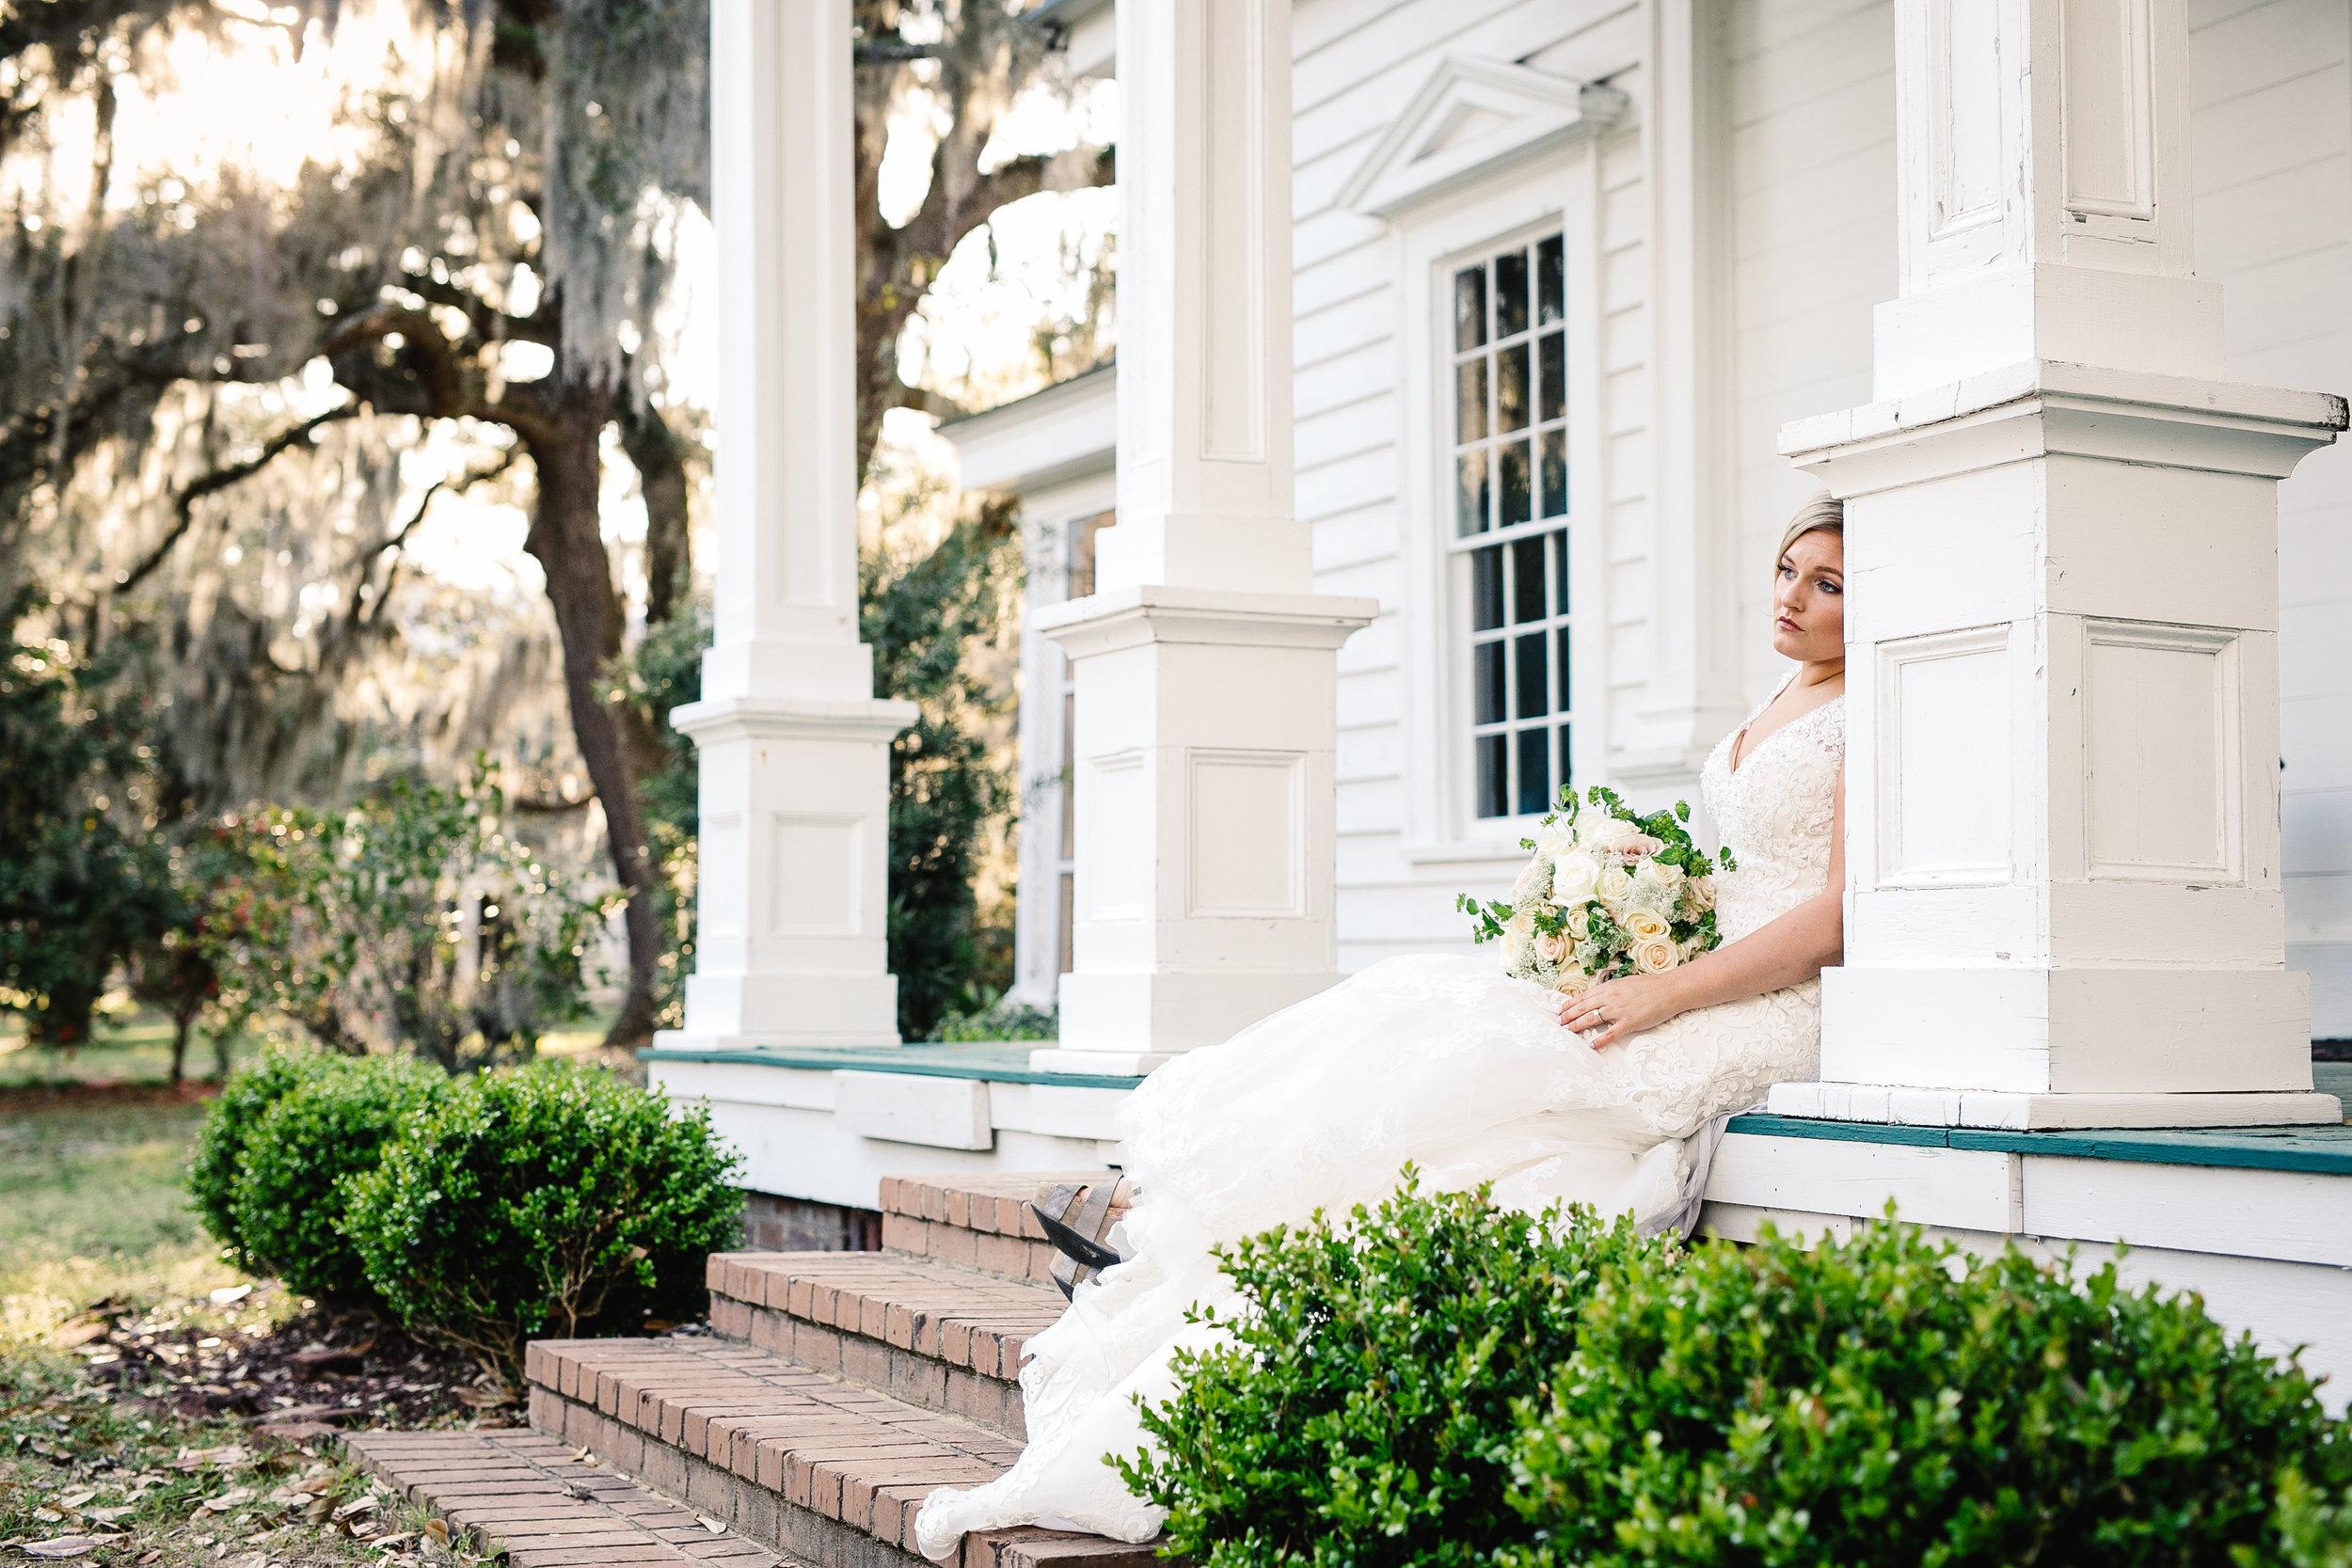 Cameron's Bridal Portrait Session at Sunnyside Plantation | Palmetto State Weddings